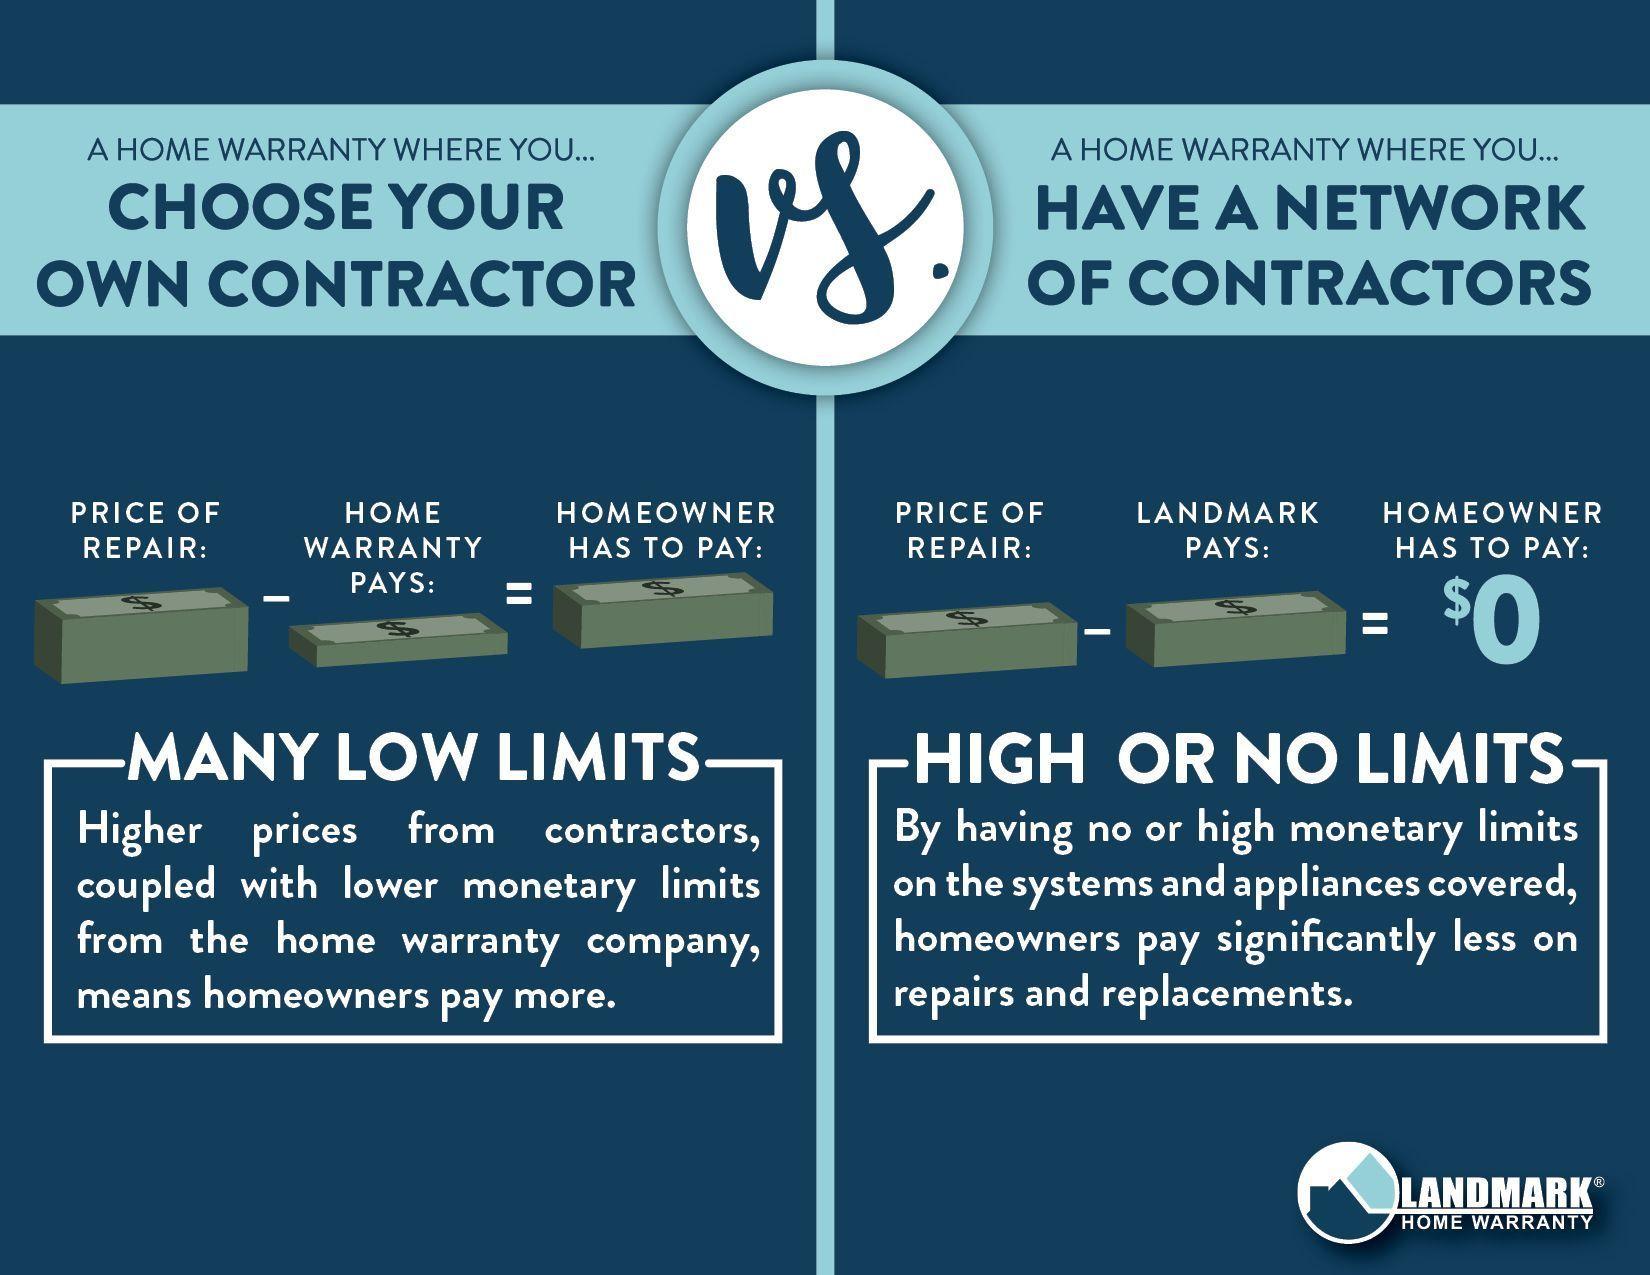 Undefined Home Warranty Home Warranty Companies Contractors